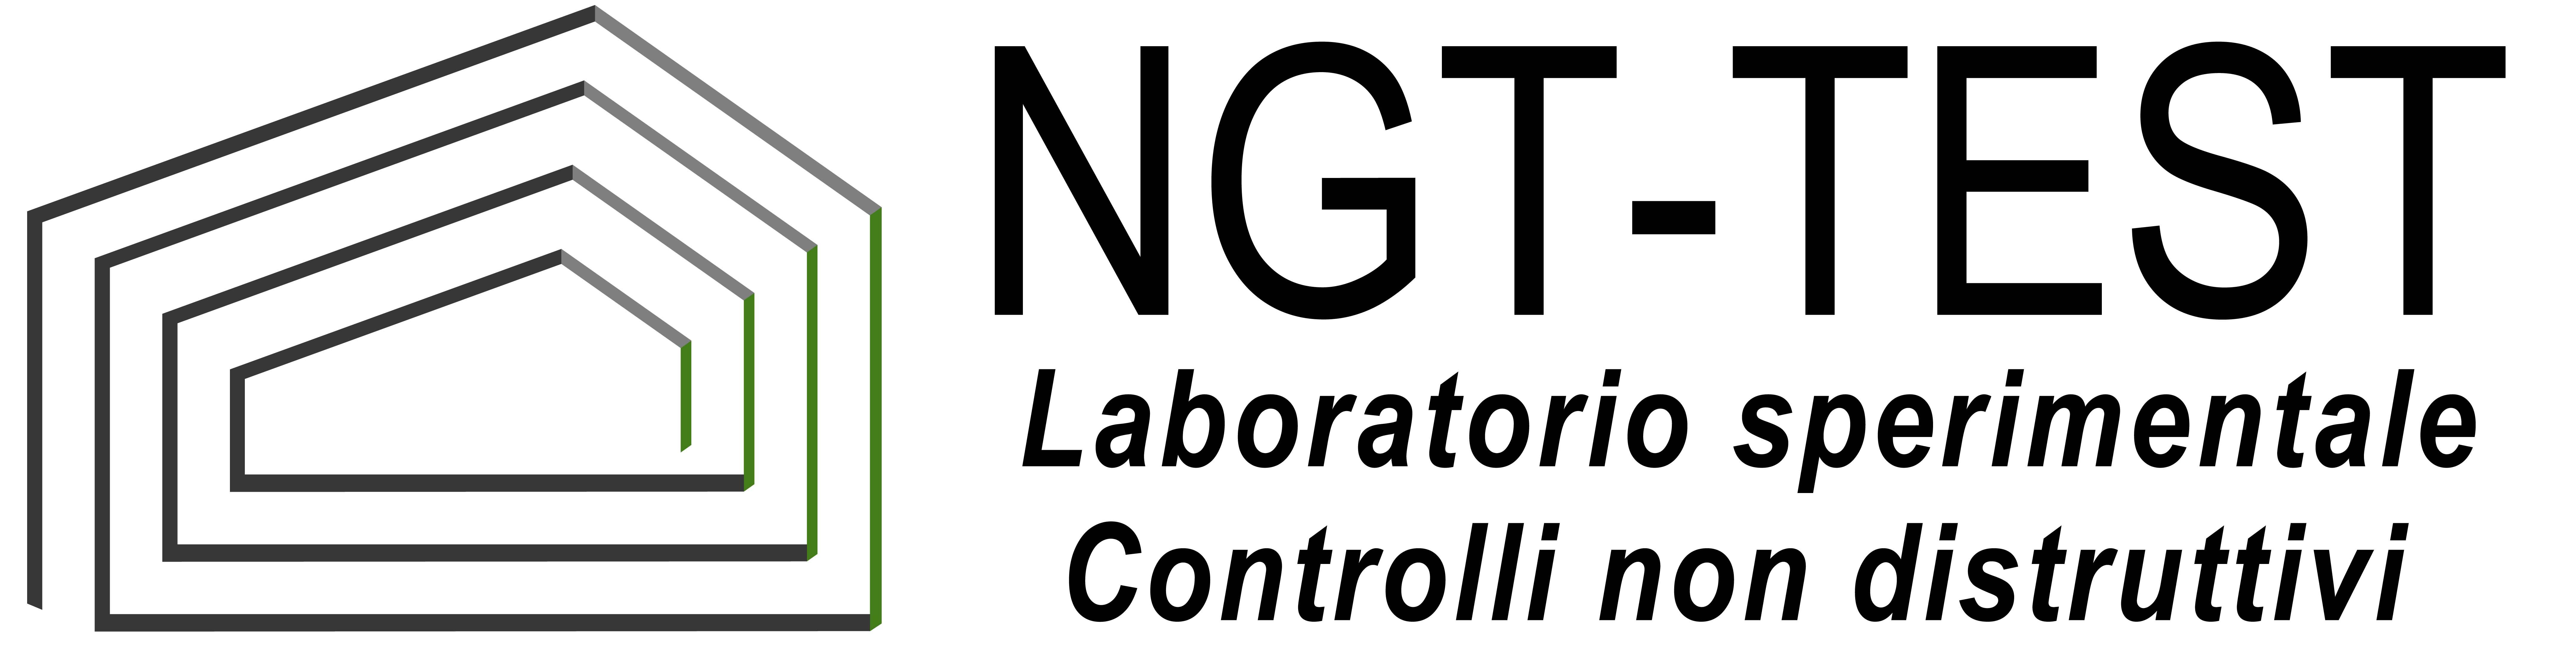 http://iniziativagimigliano.com/domain/wp-content/uploads/2017/07/LogoNEWNgt_TEST.jpg